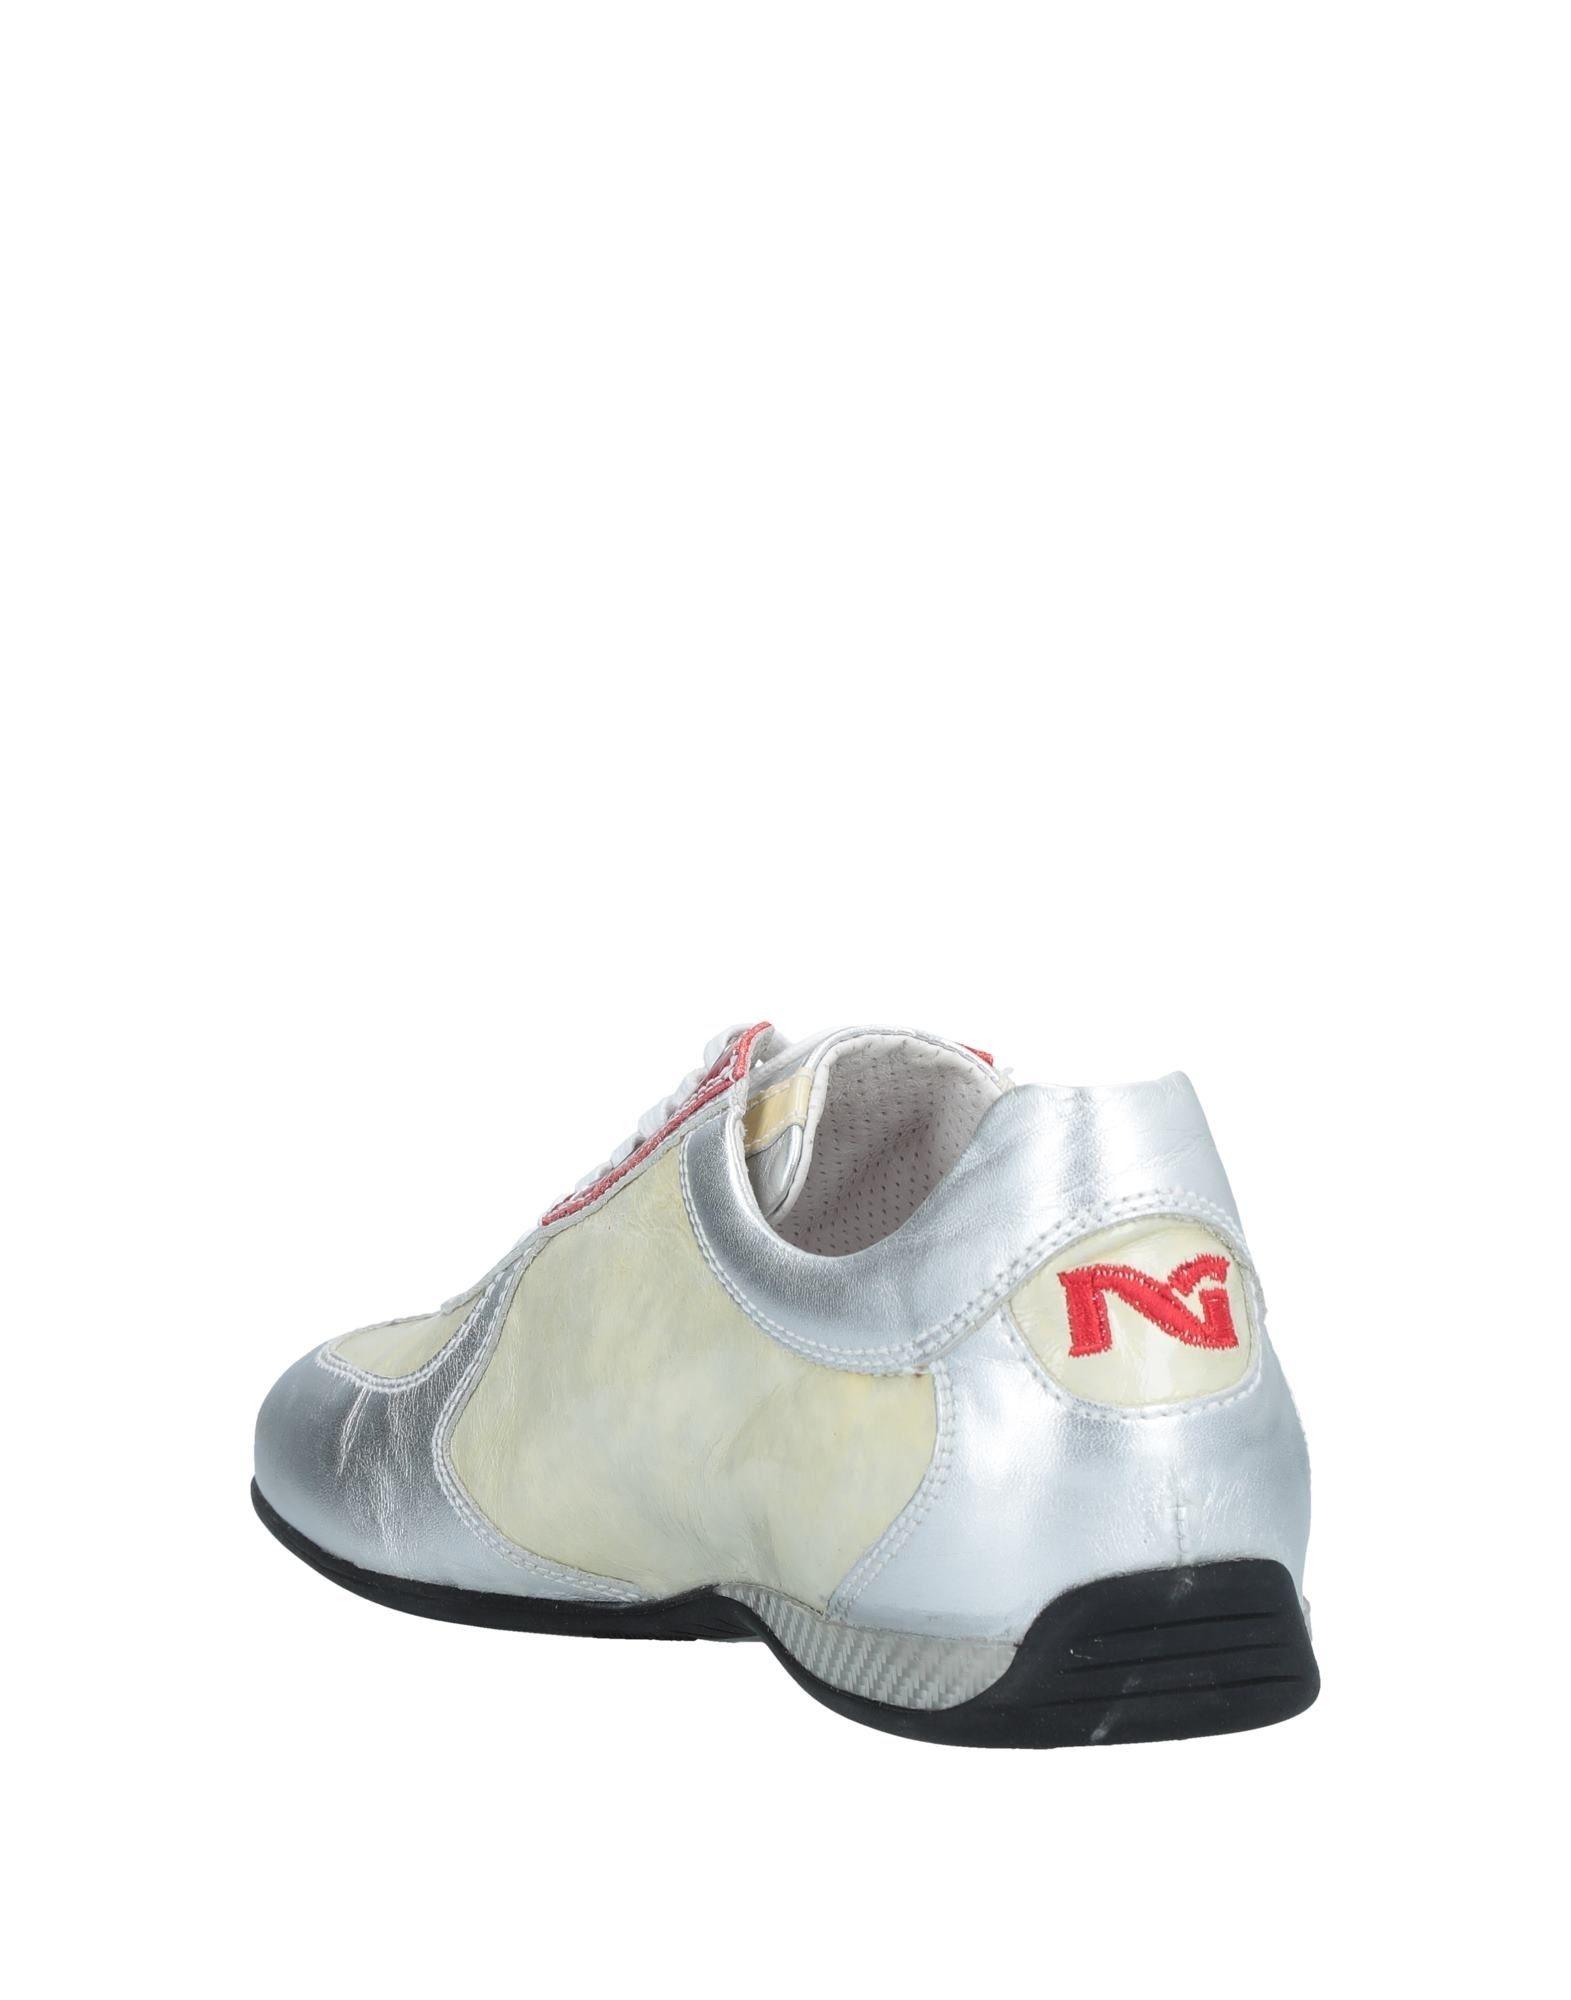 Nero Giardini Sneakers Damen    11538998AE Gute Qualität beliebte Schuhe 552460